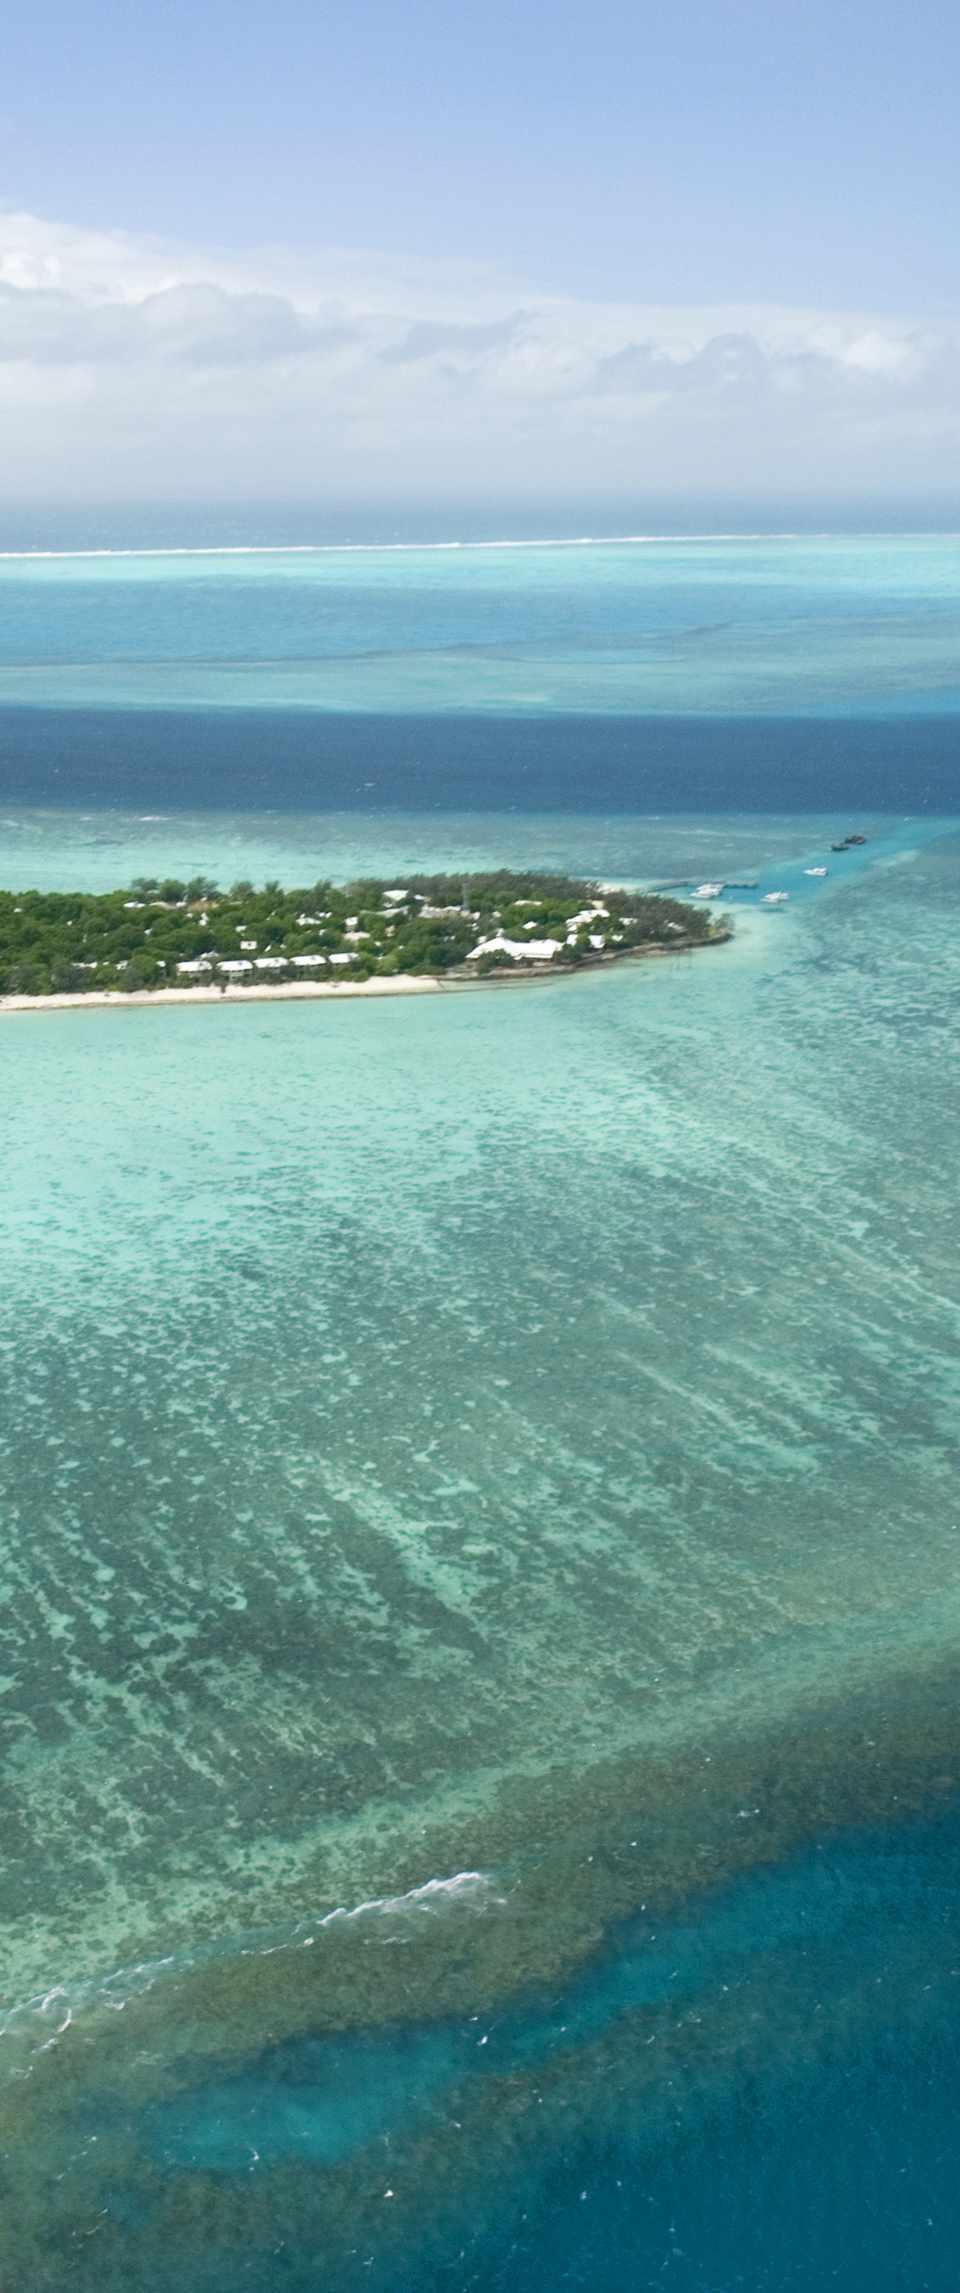 Small island on the ocean